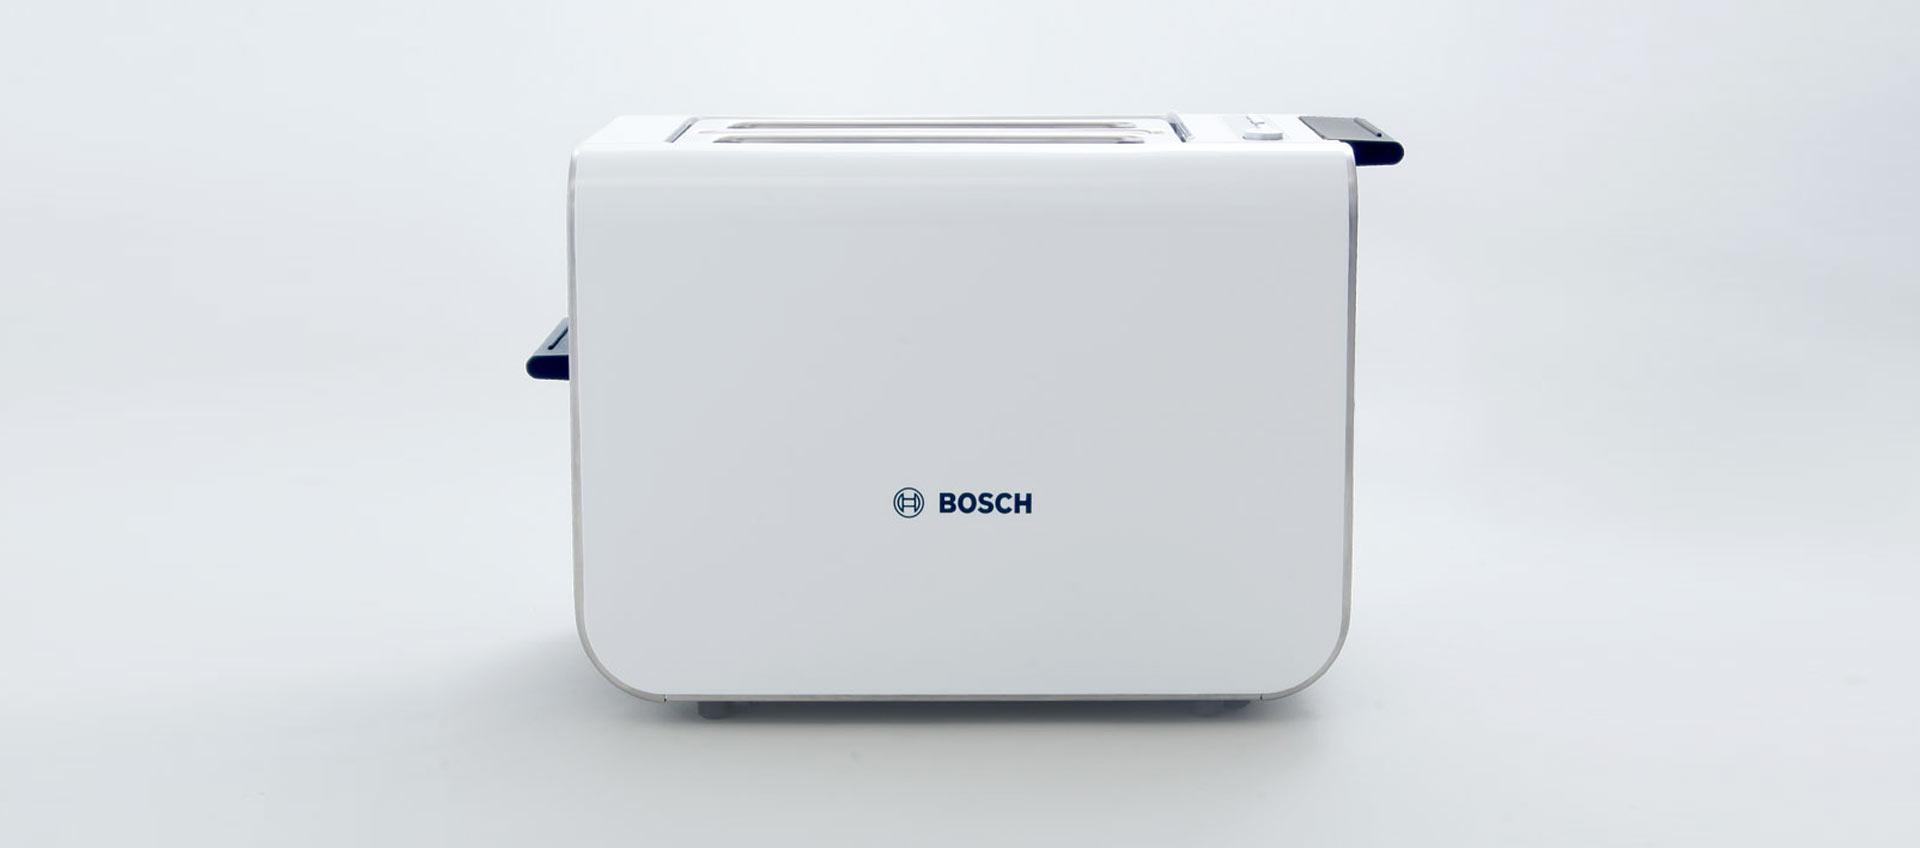 Product Design Toaster for Bosch Siemens Hausgeräte